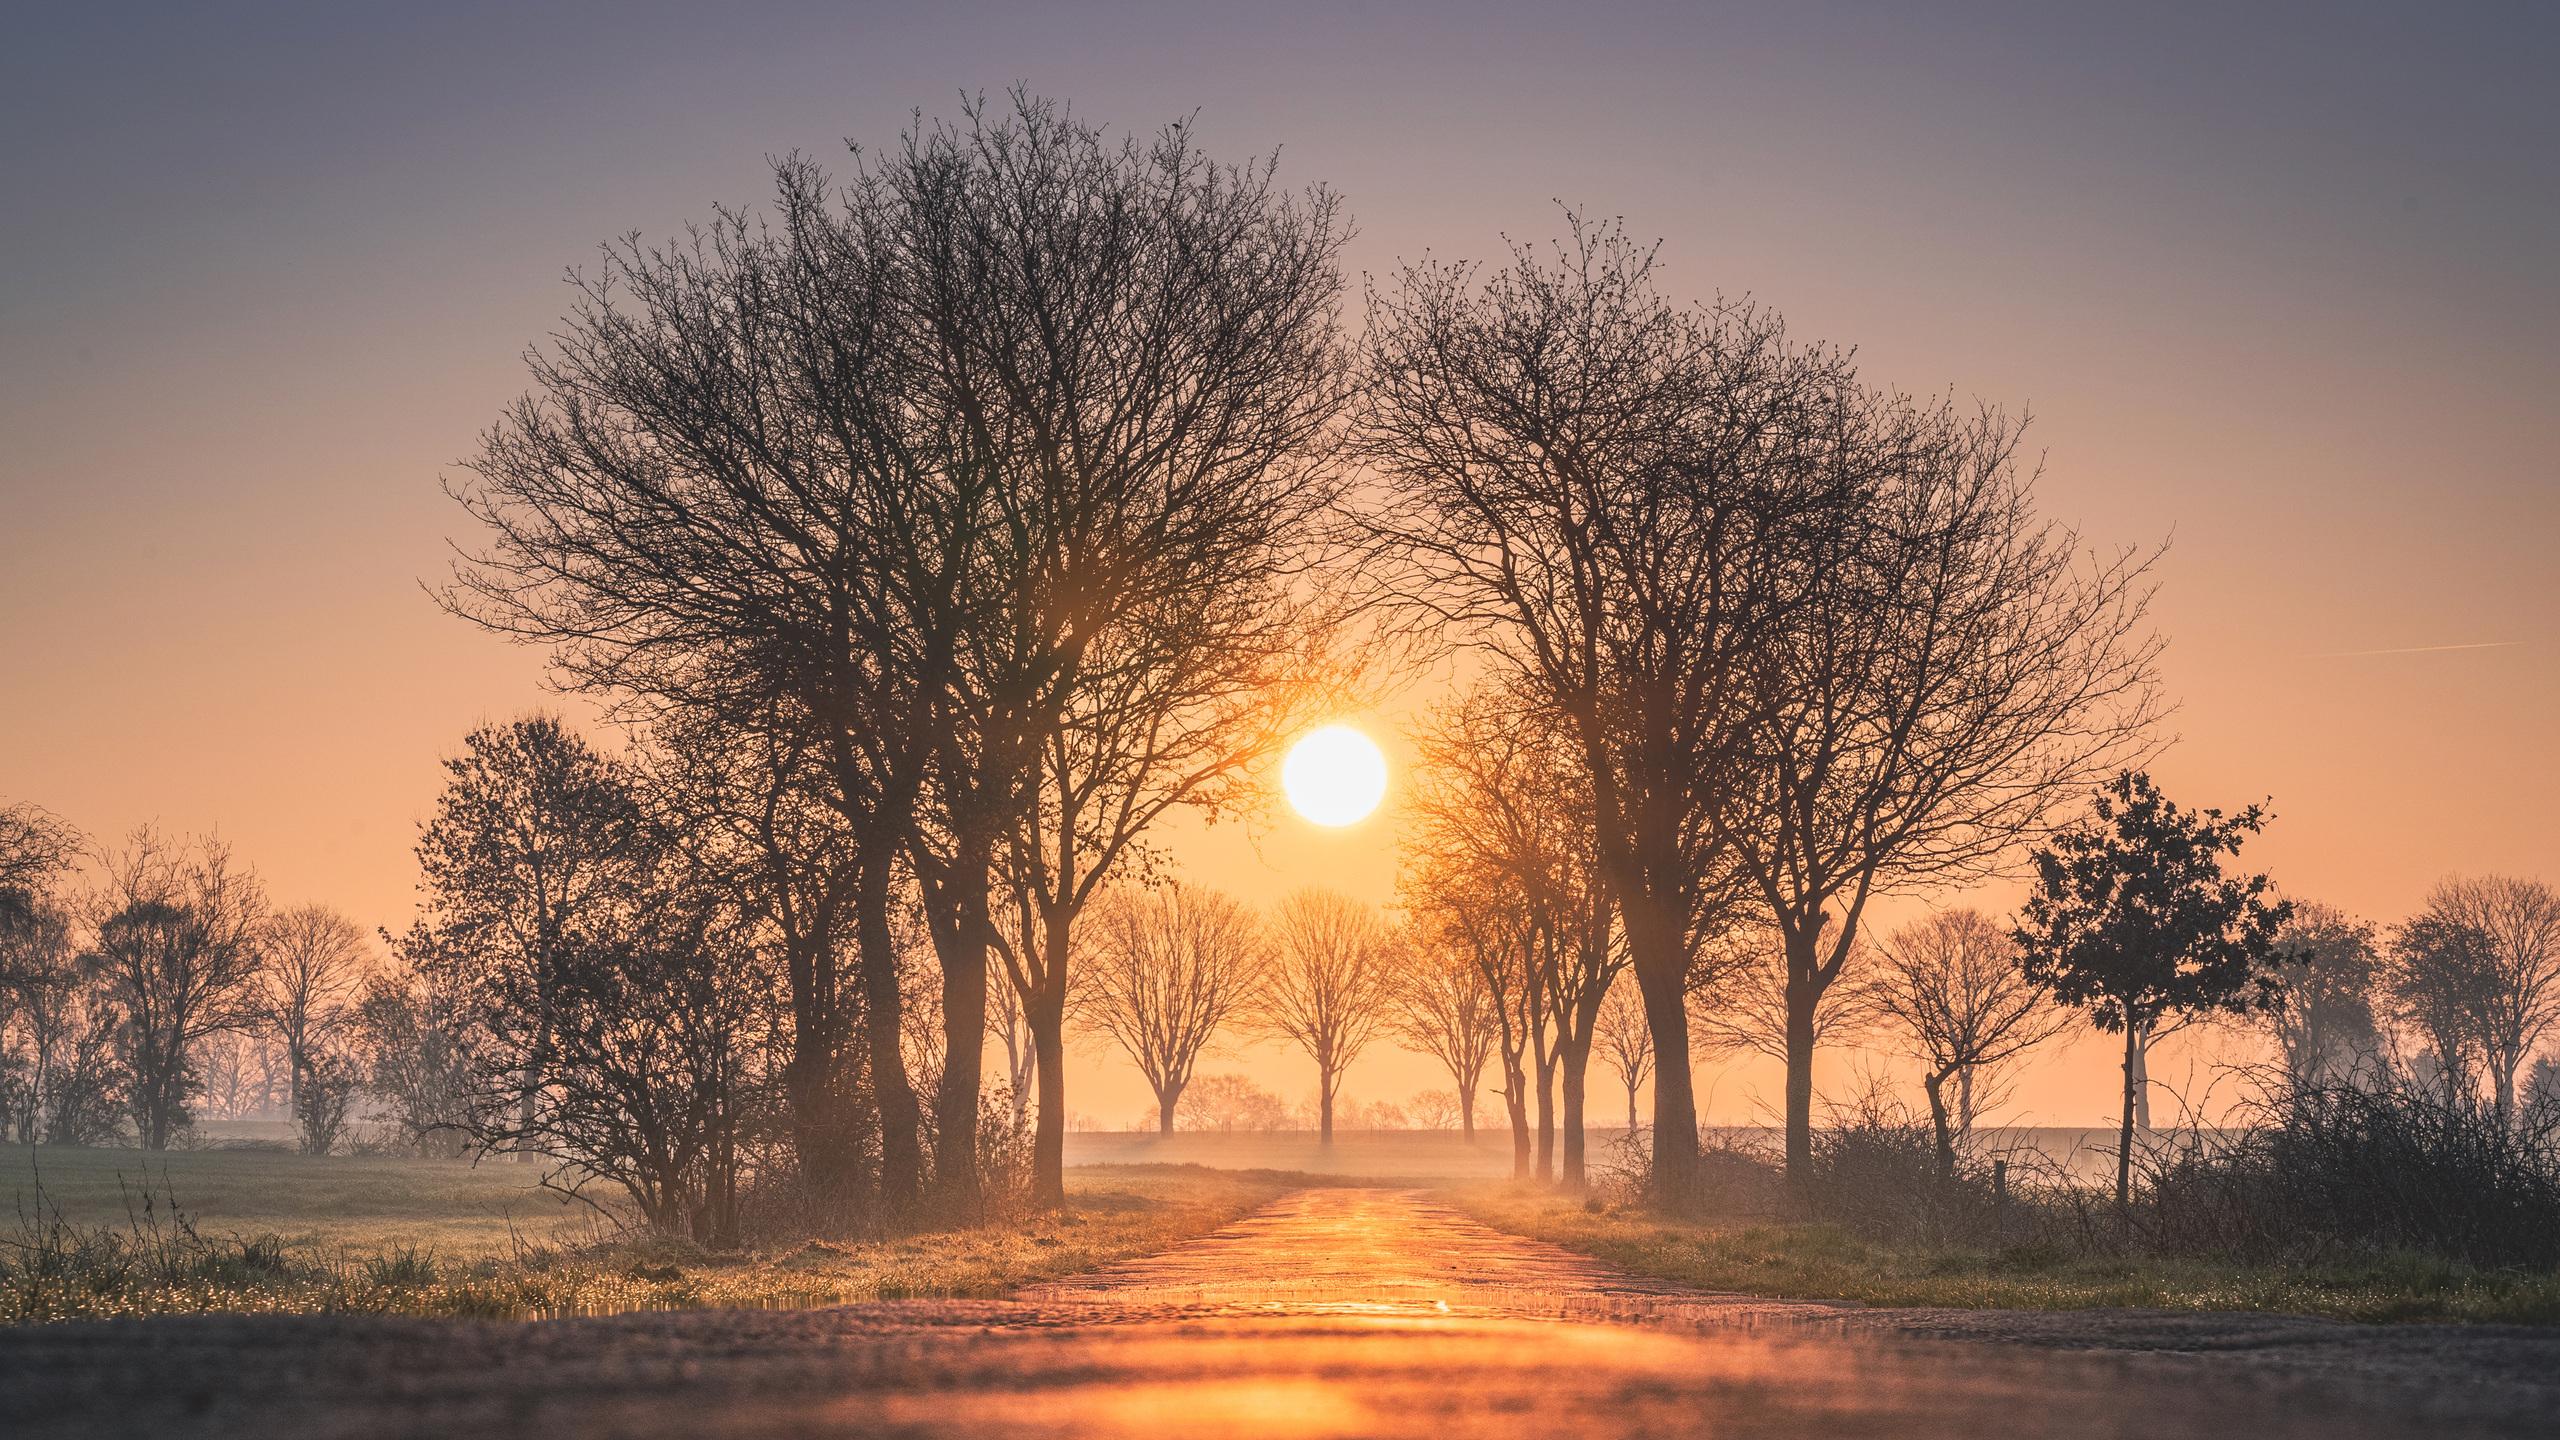 sunrises-and-sunsets-trees-sun-fog-4k-nw.jpg